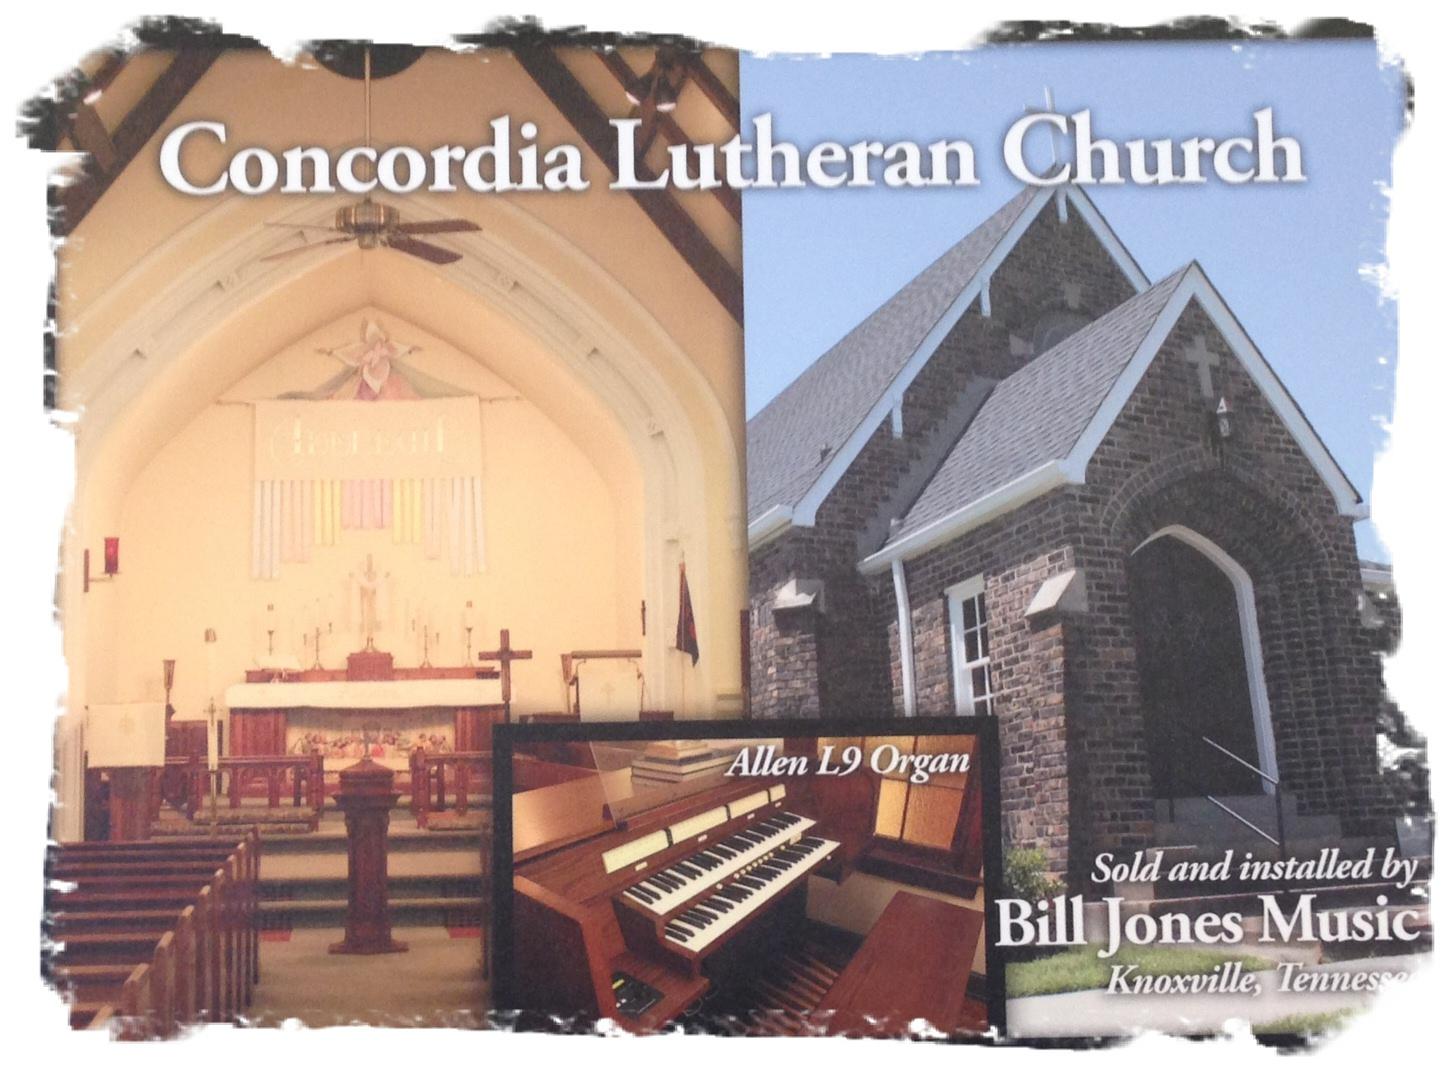 Concordia Lutheran Church Allen L9 Organ